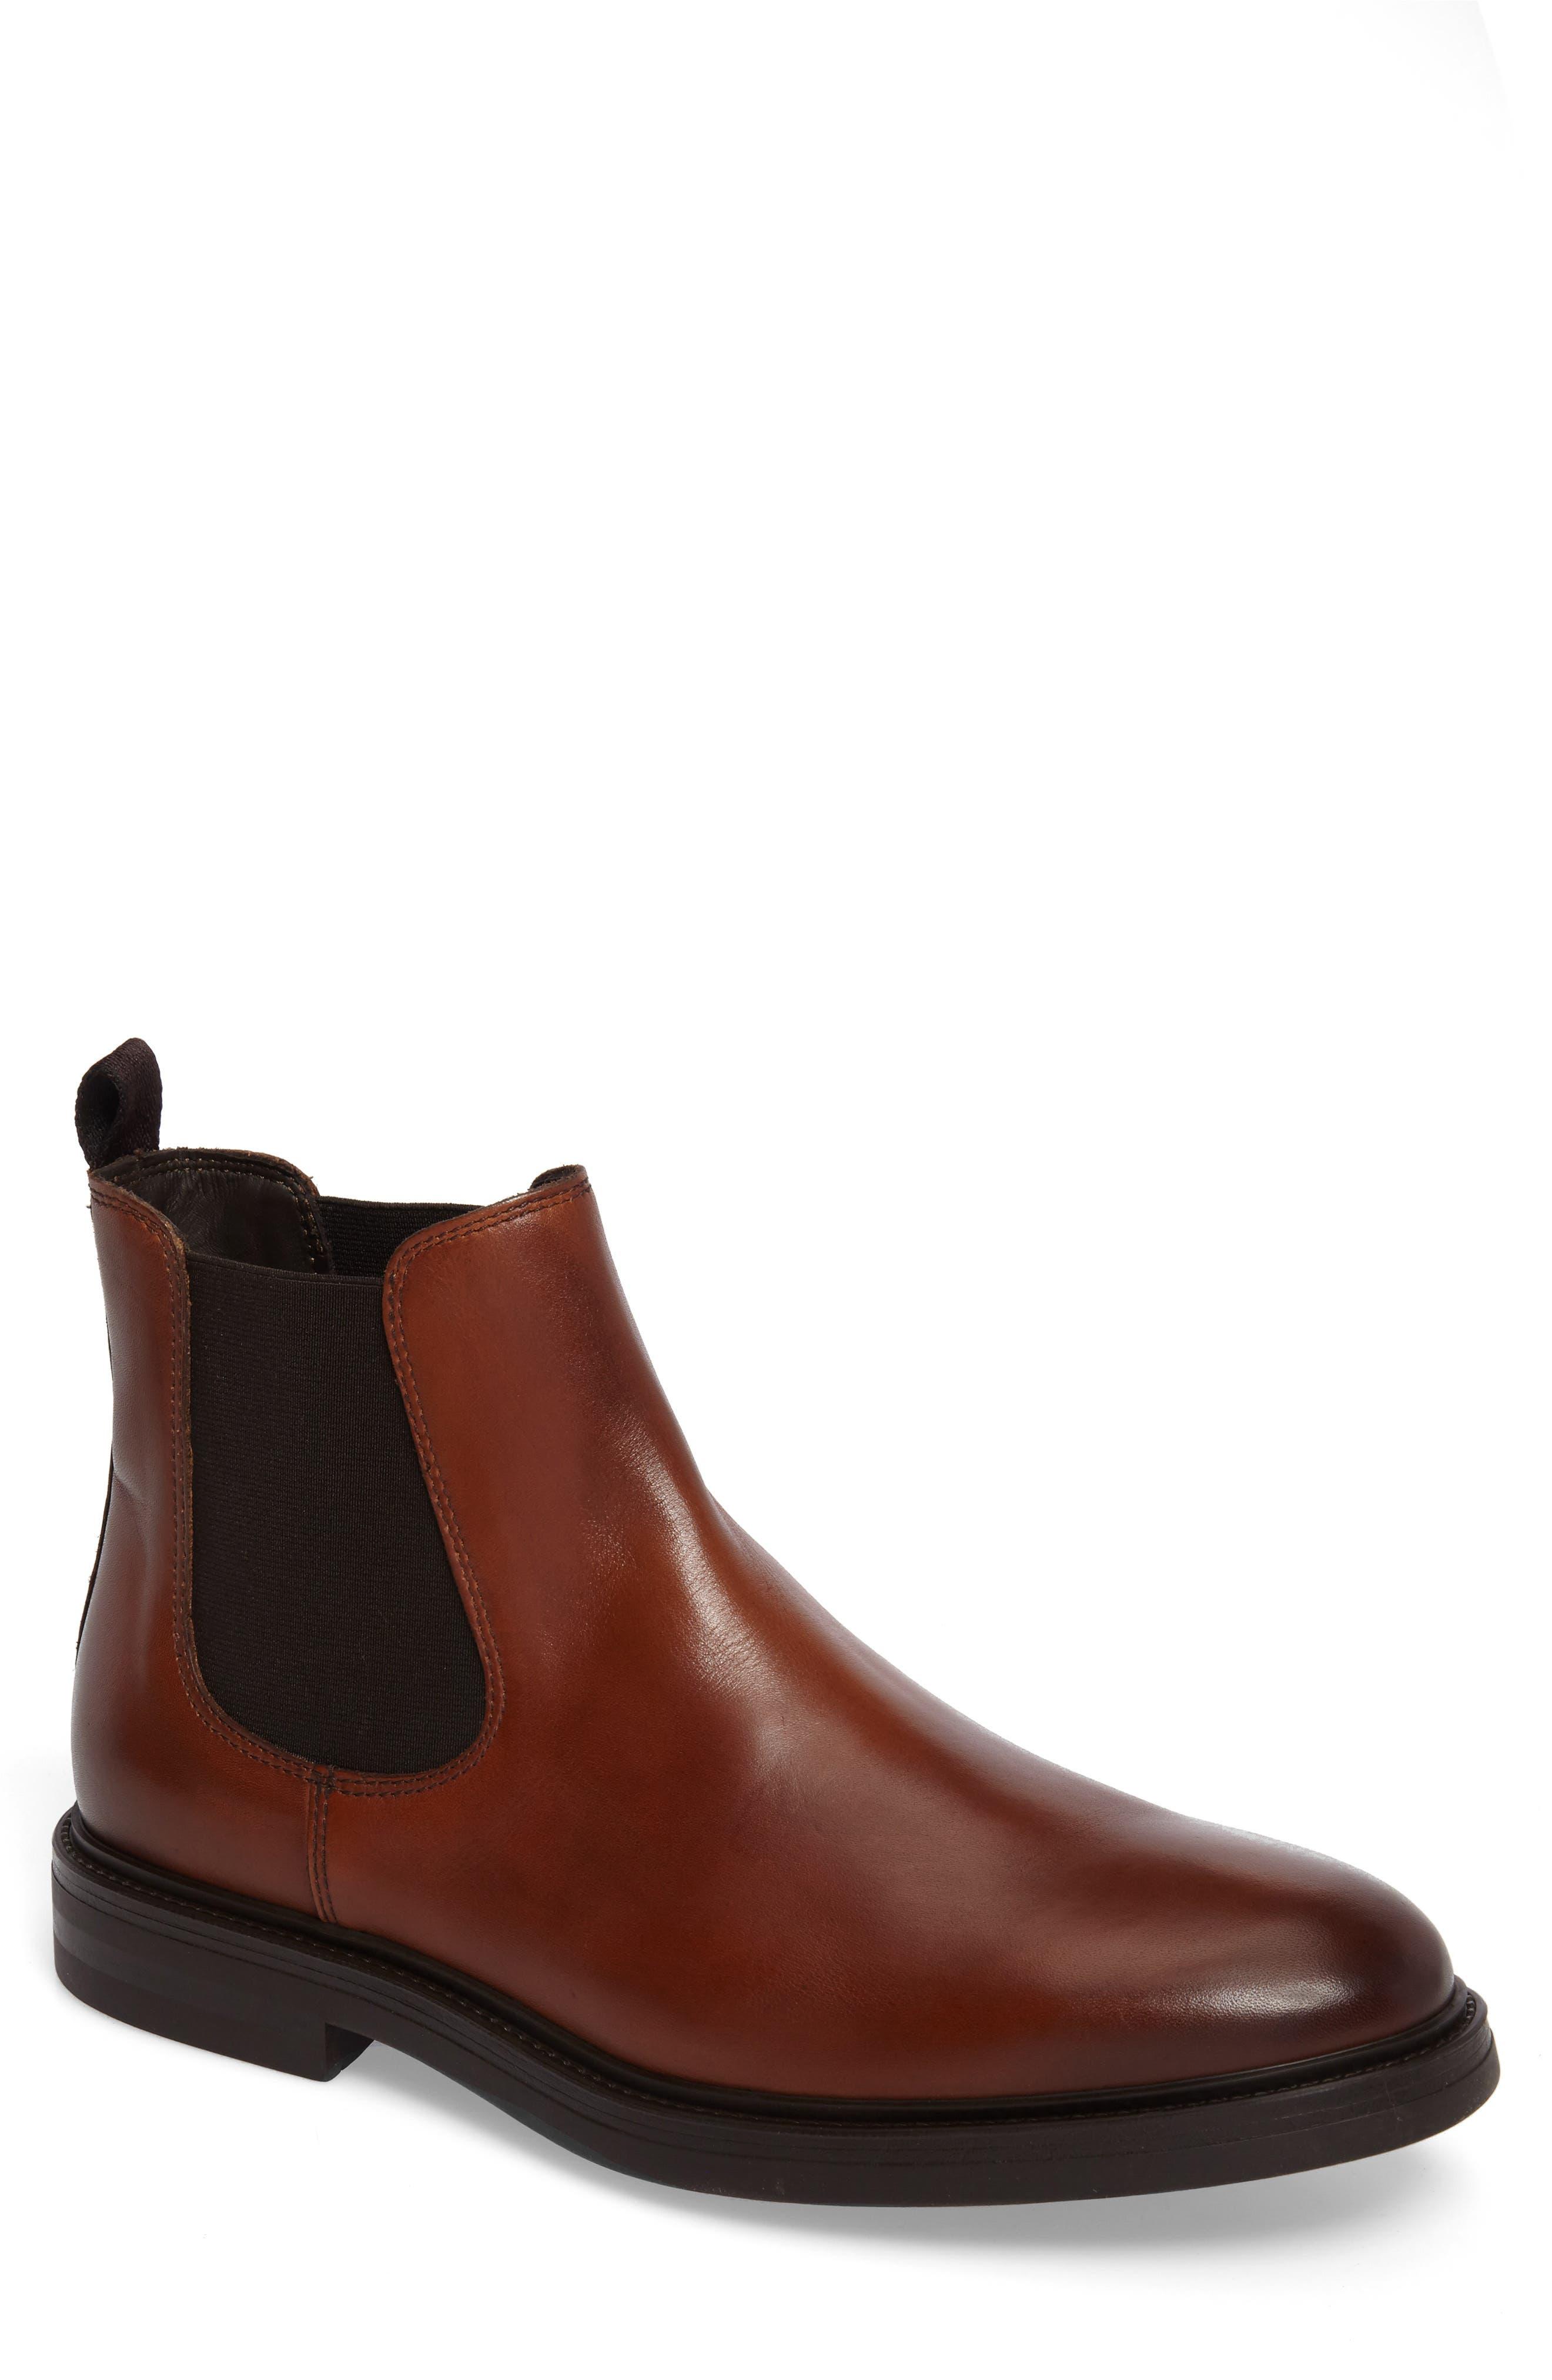 A. TESTONI Chelsea Boot